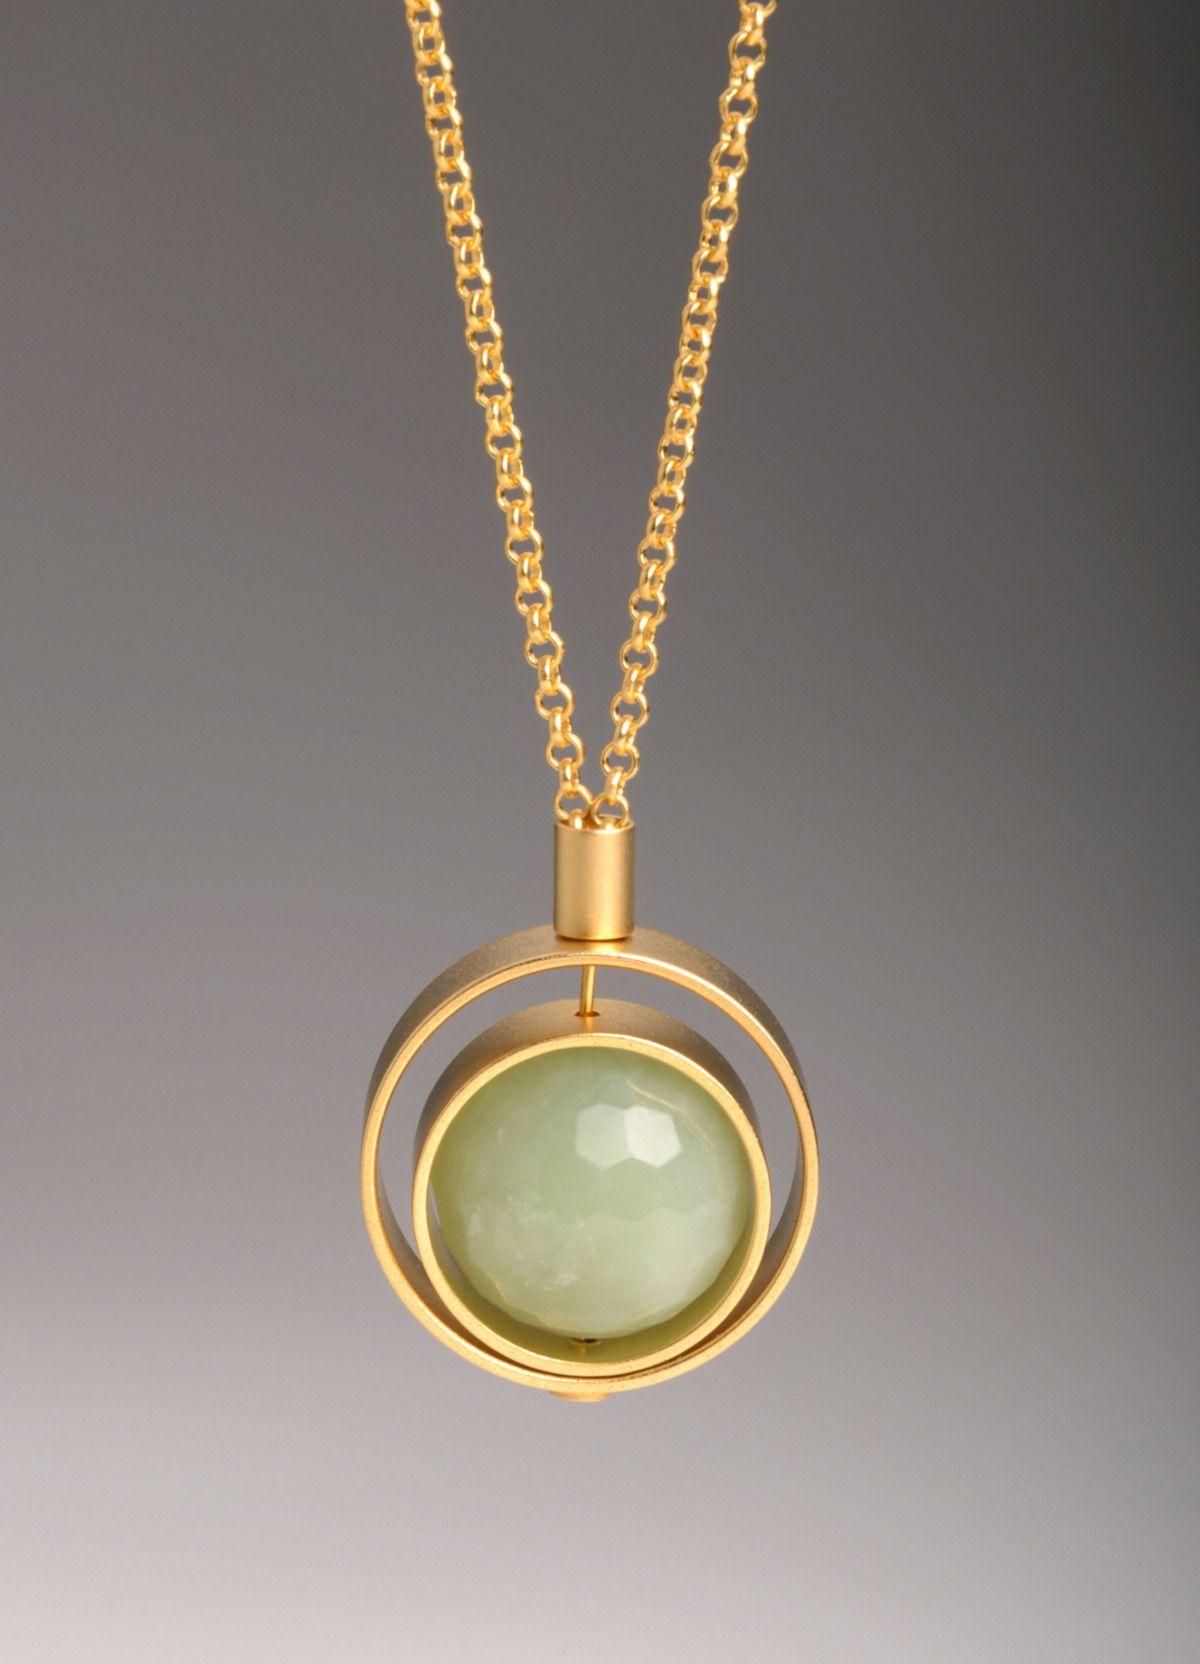 Green Jade / Pink Quartz Stone Pendant Necklace 24K Pure GOLD Women Ladies  Chain